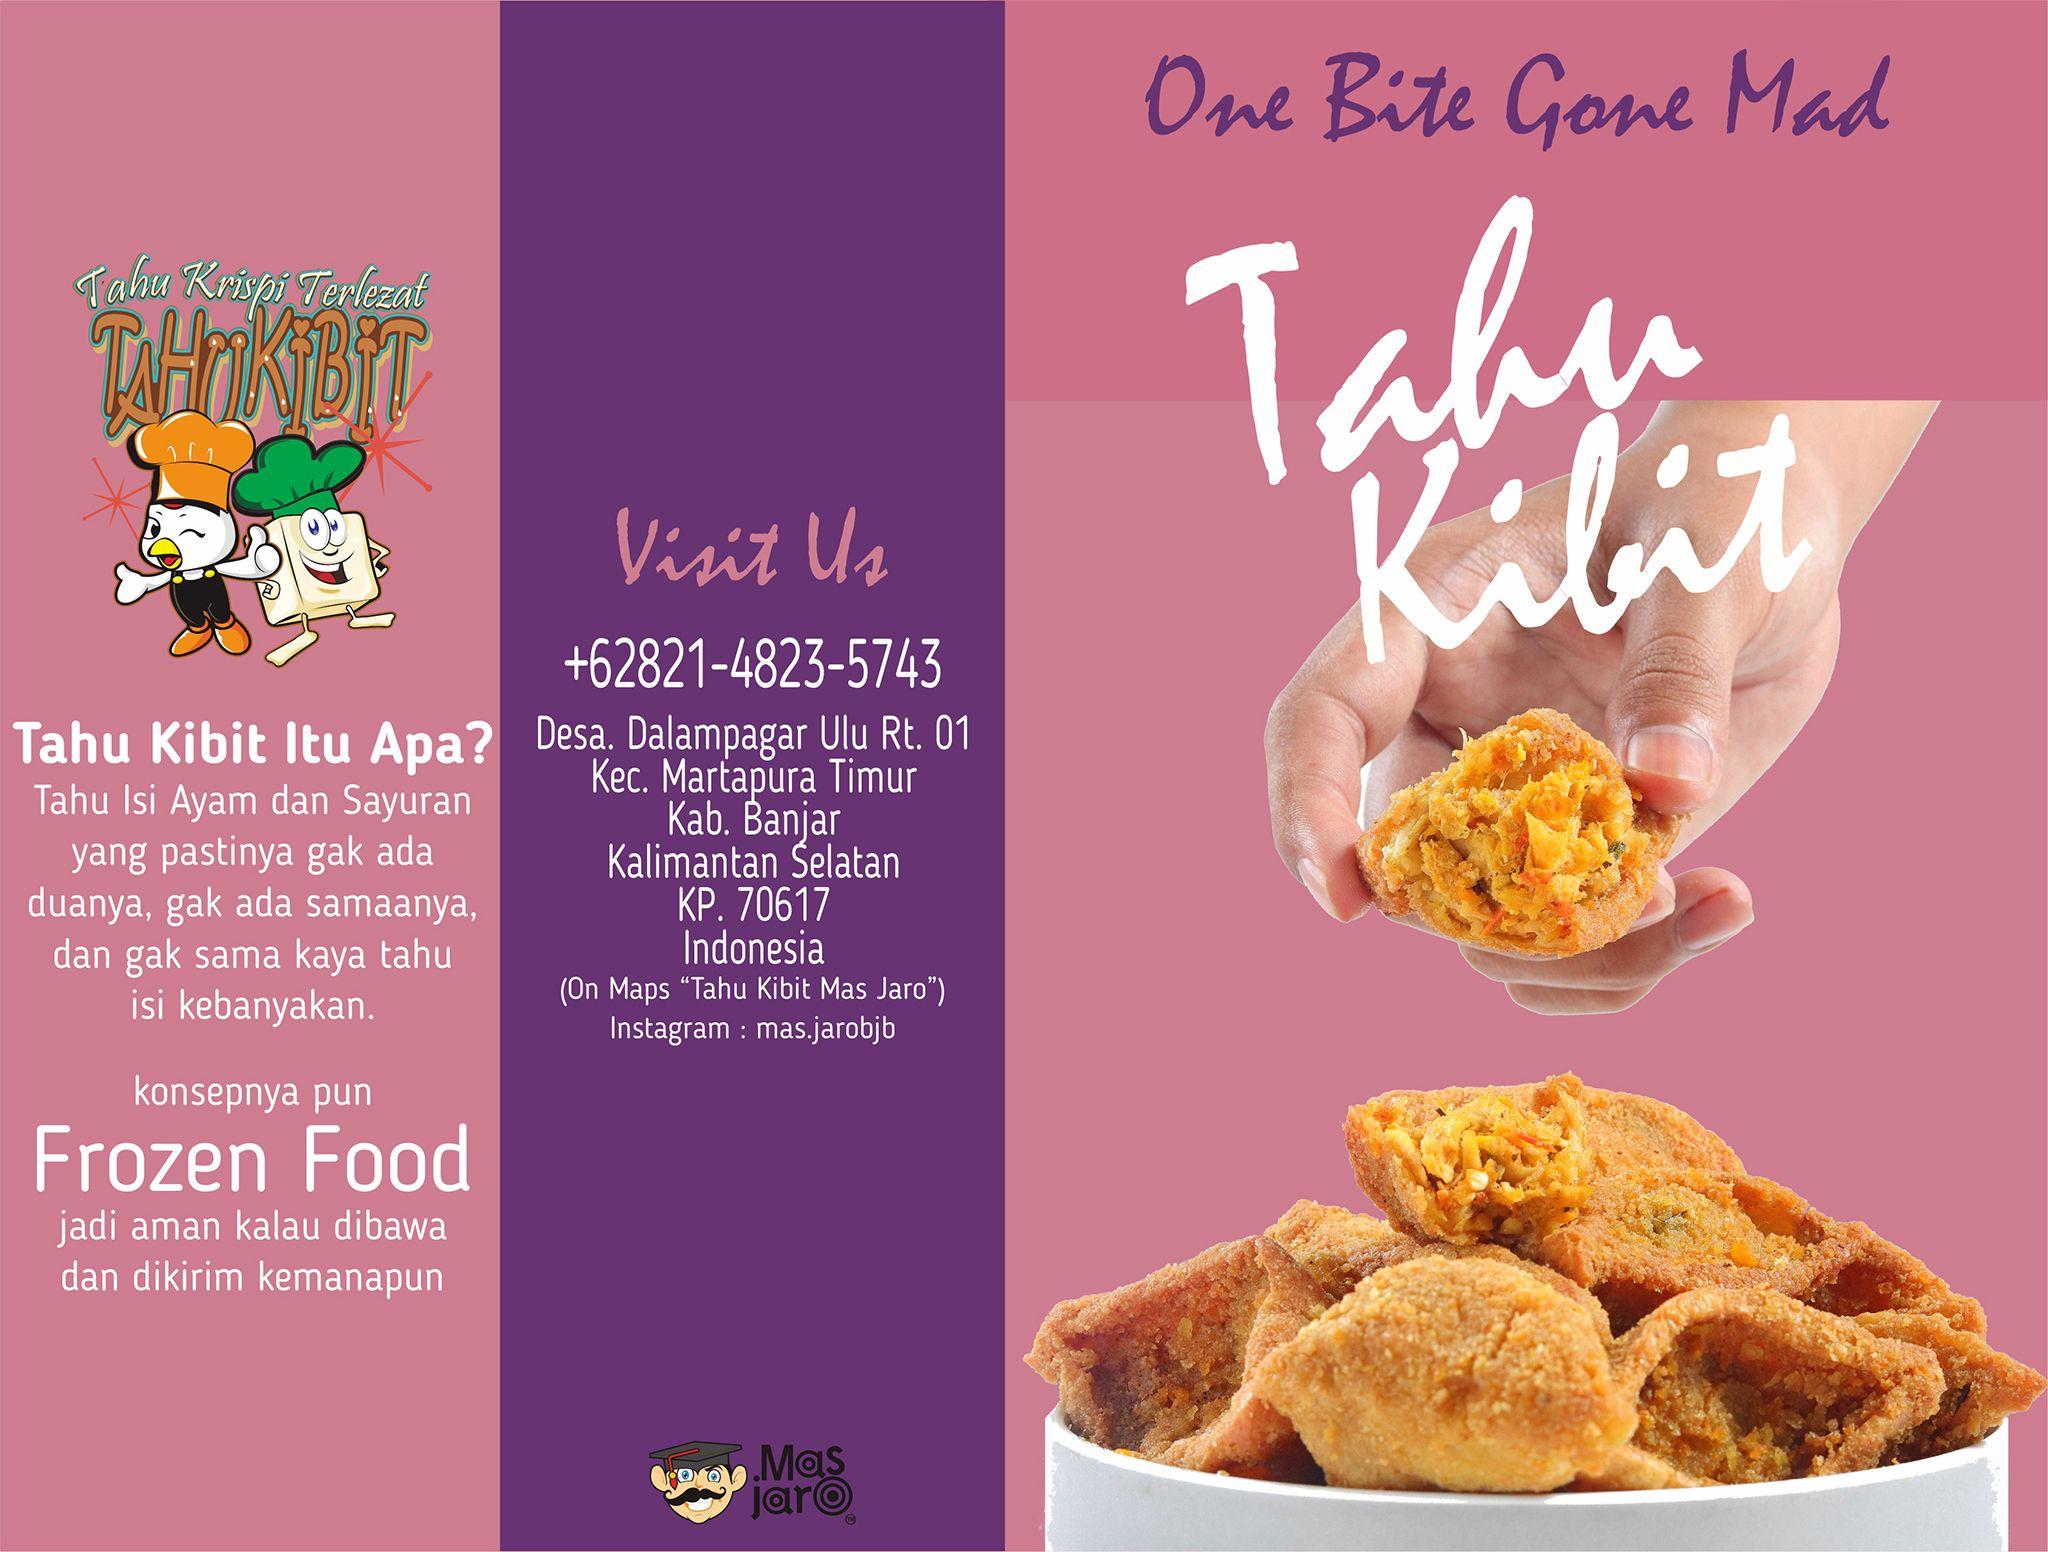 Sms Wa 0821 4823 5743 Tsel Tahu Crispy Isi Bakso Terlezat Banjarbaru Resep Tahu Bakso Sayuran